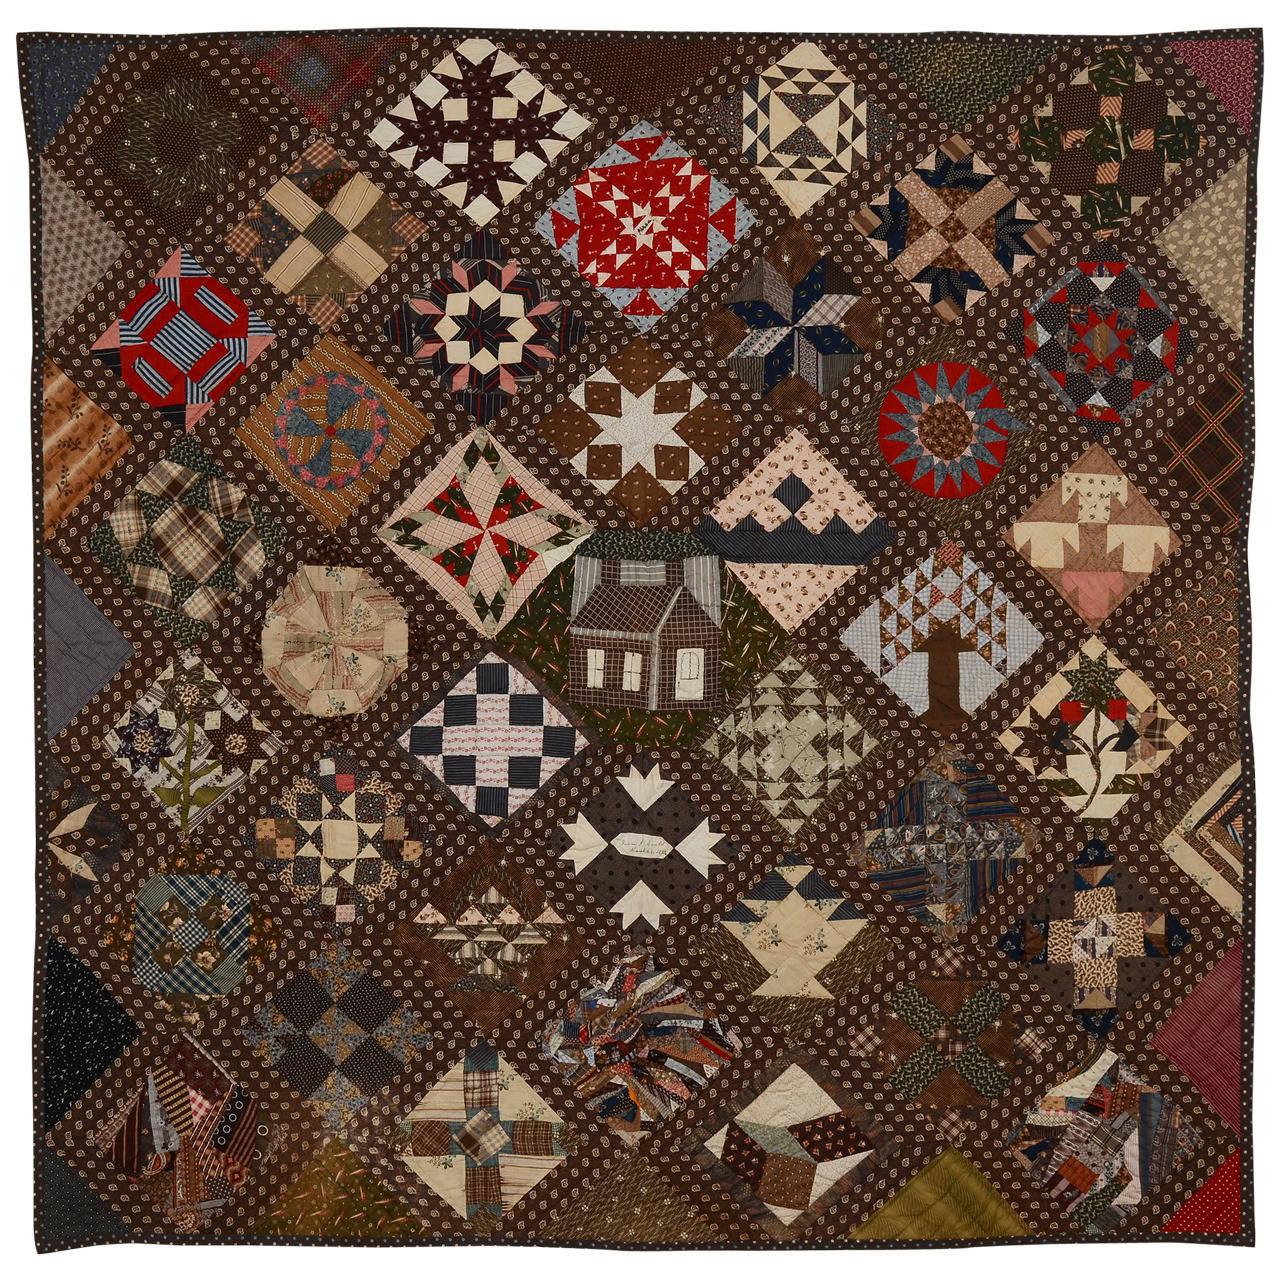 New England Sampler Quilt Dated 1891